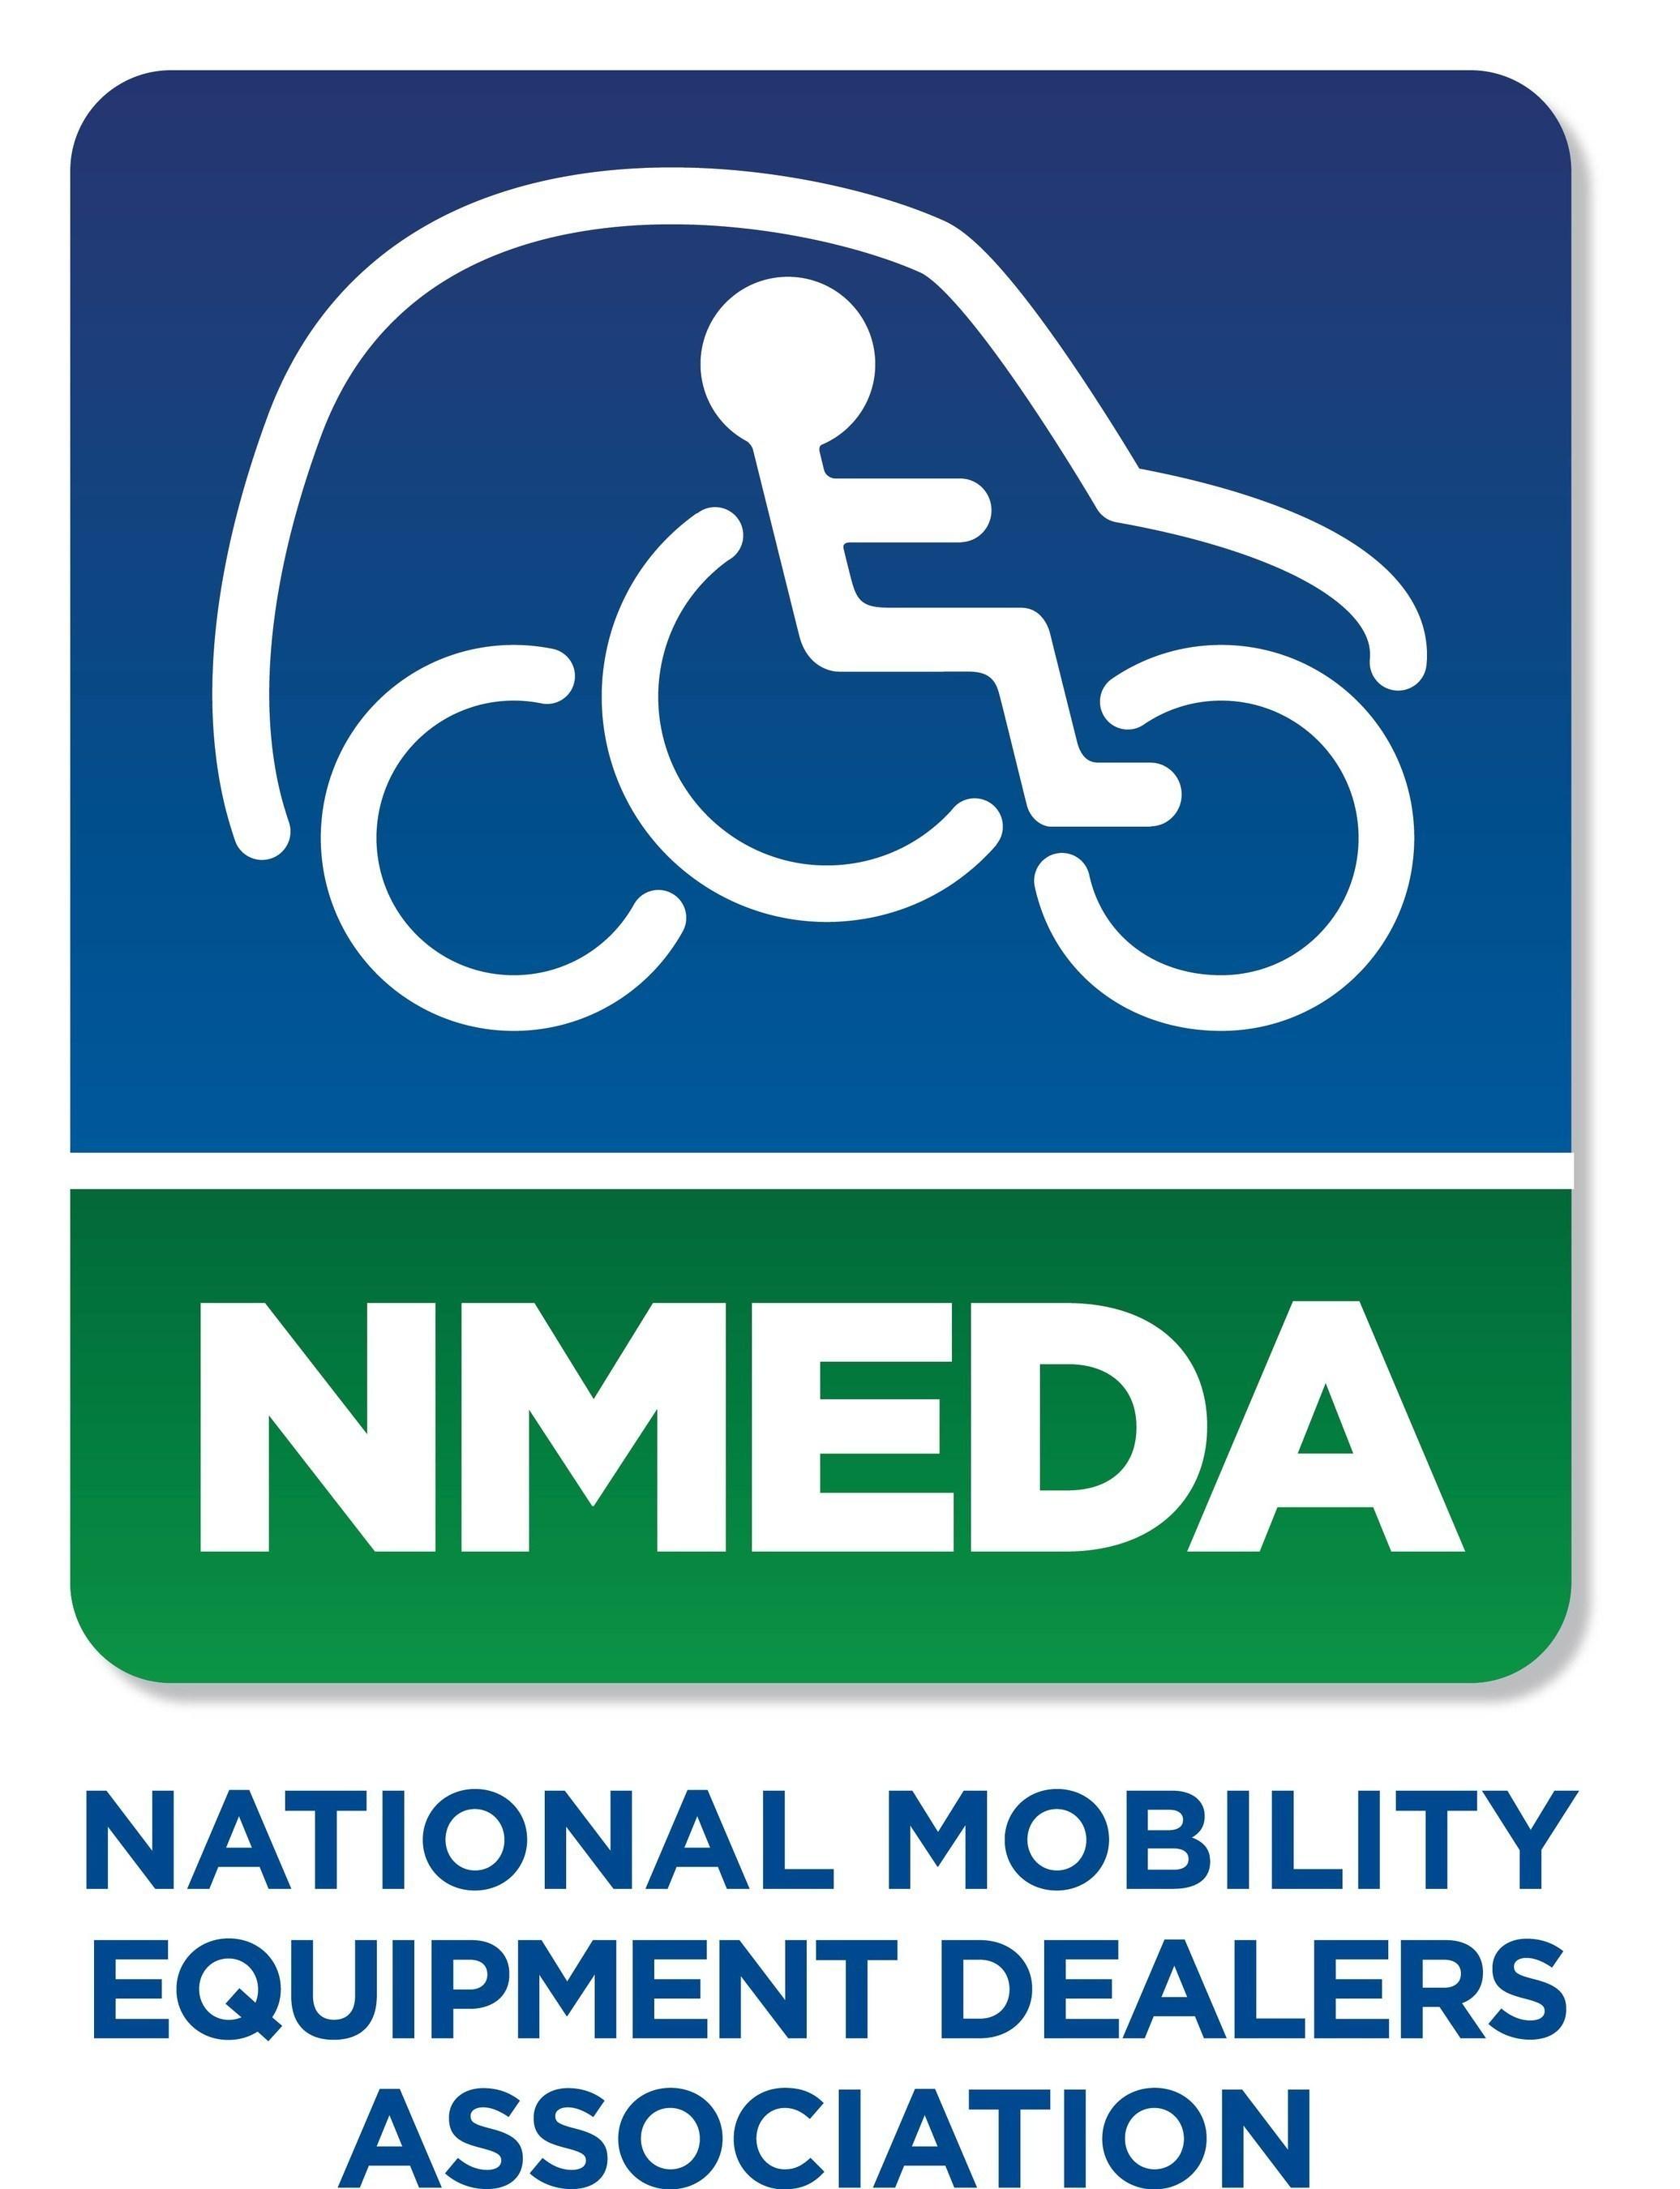 National Mobility Equipment Dealers Association logo